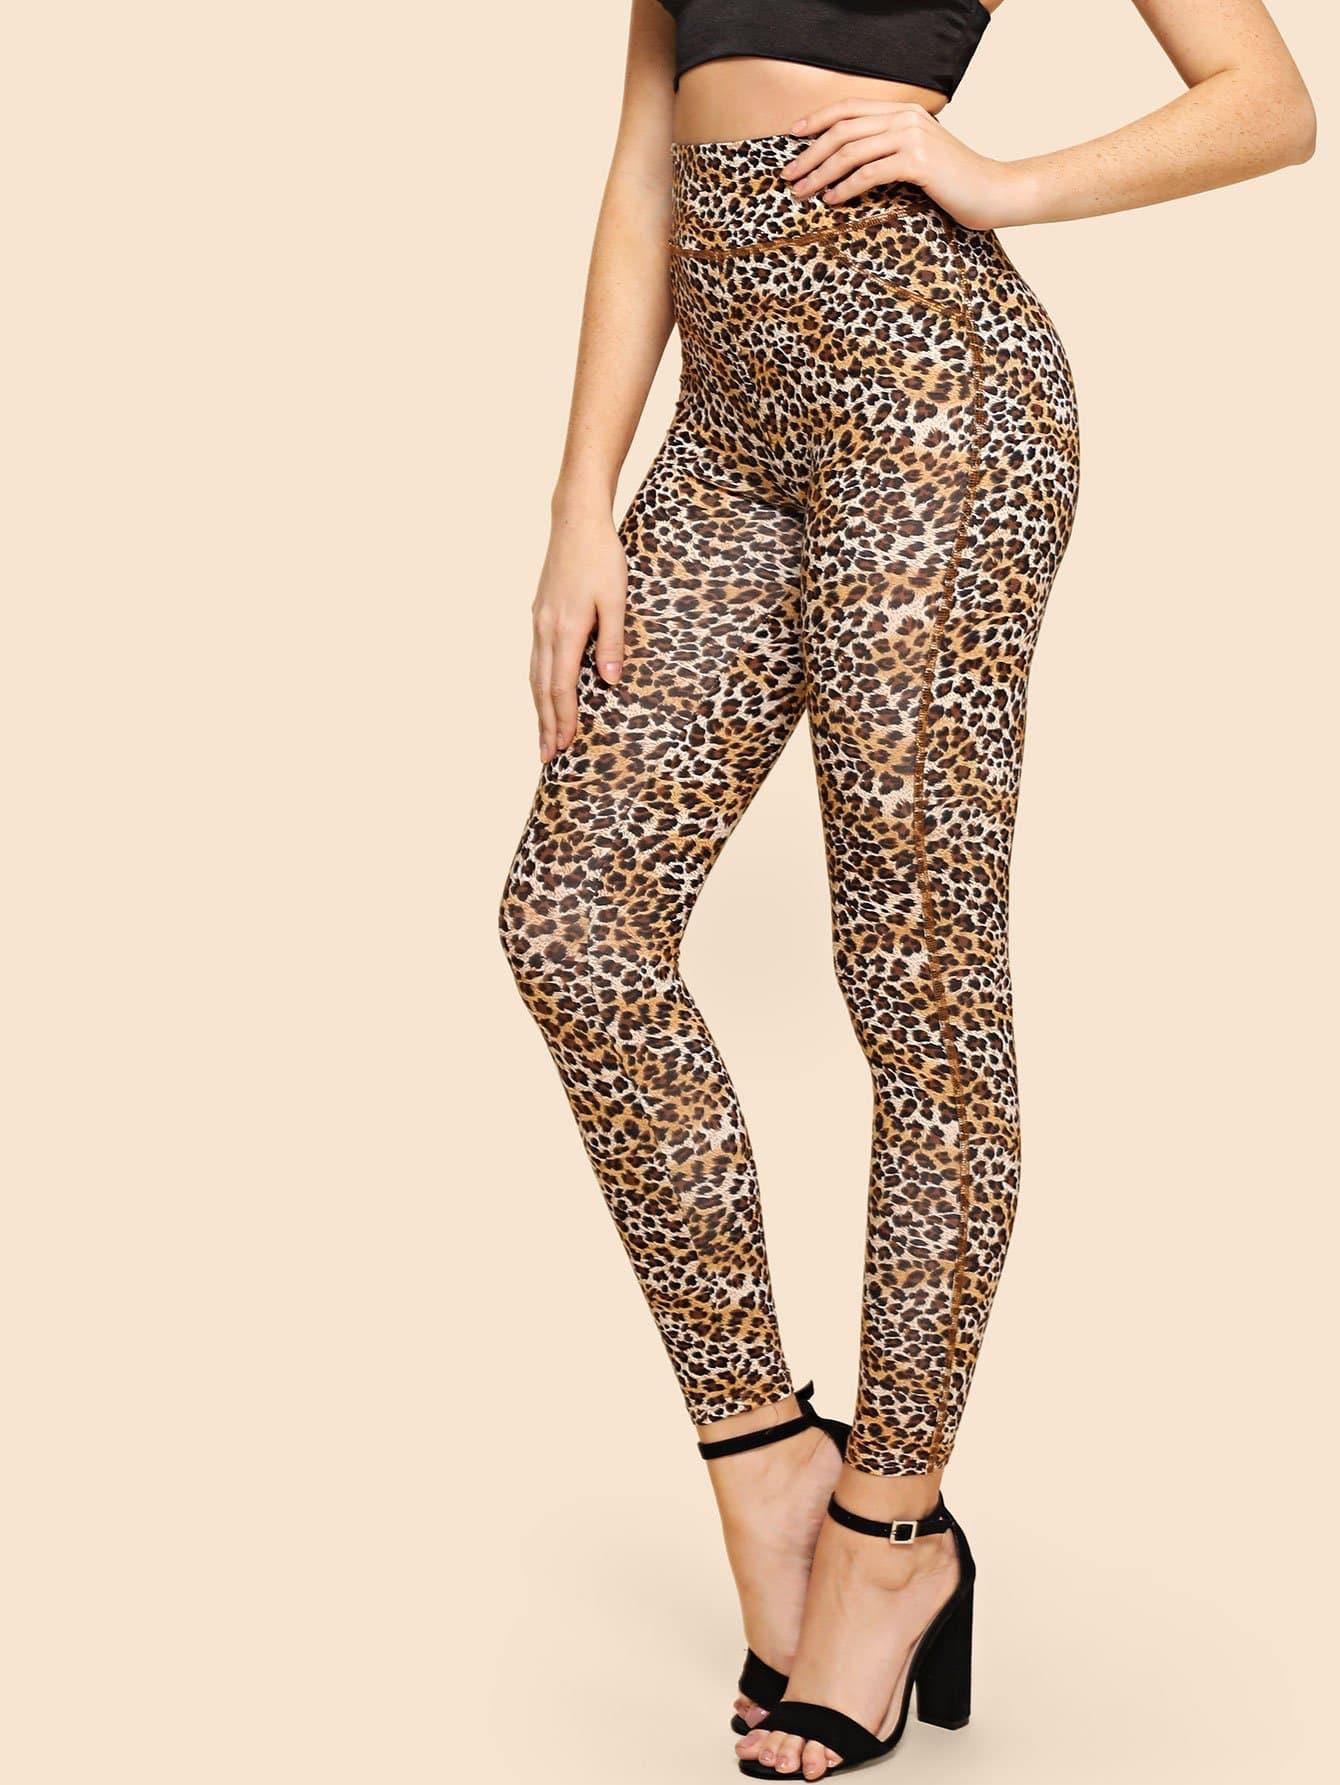 Wide Waistband Leopard Leggings leopard print leggings